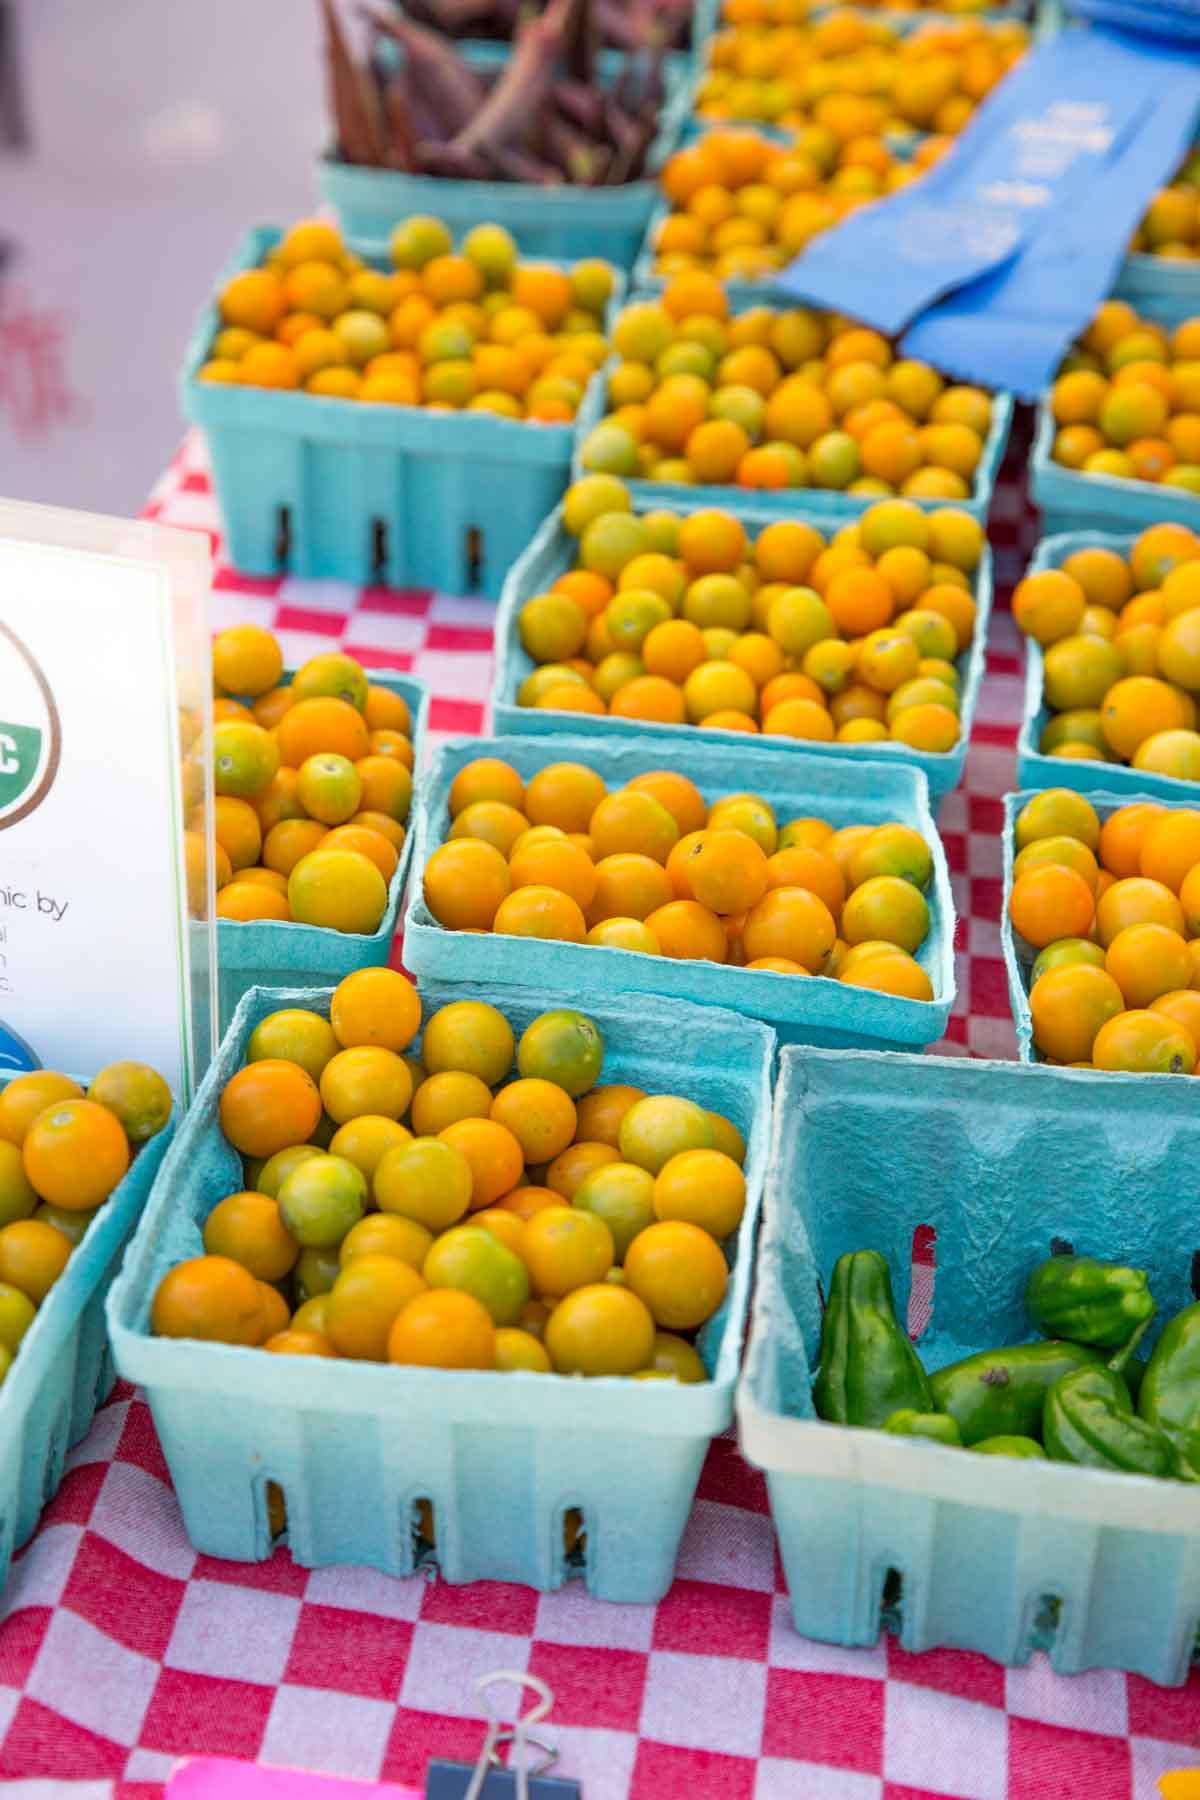 Durham Farmers Market tomatoes